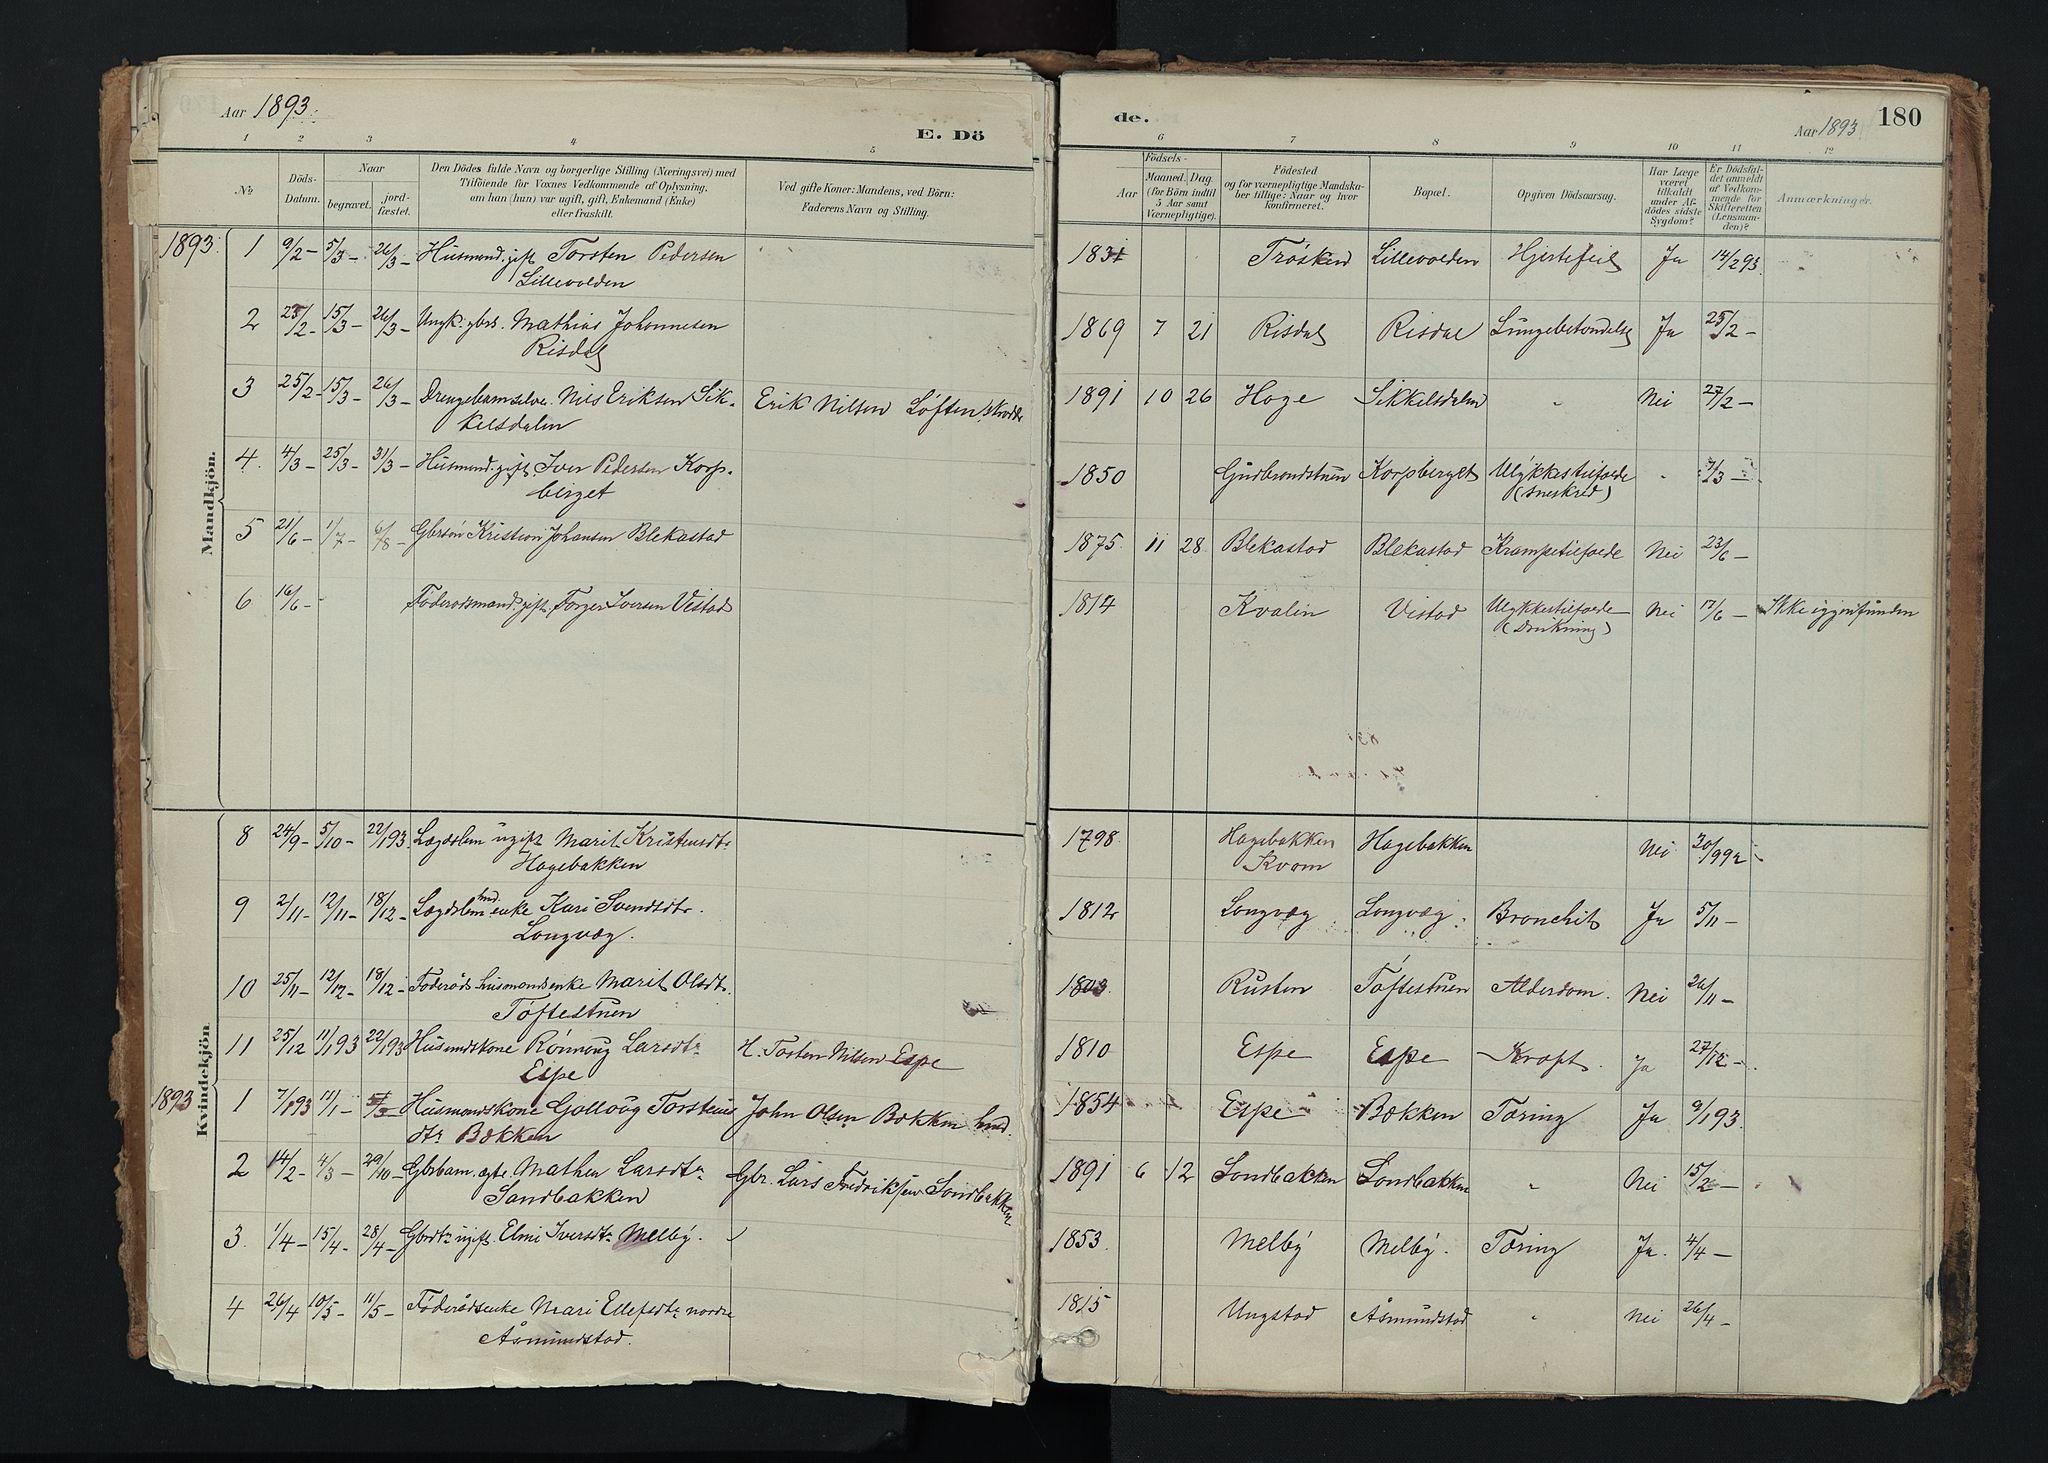 SAH, Nord-Fron prestekontor, Ministerialbok nr. 5, 1884-1914, s. 180